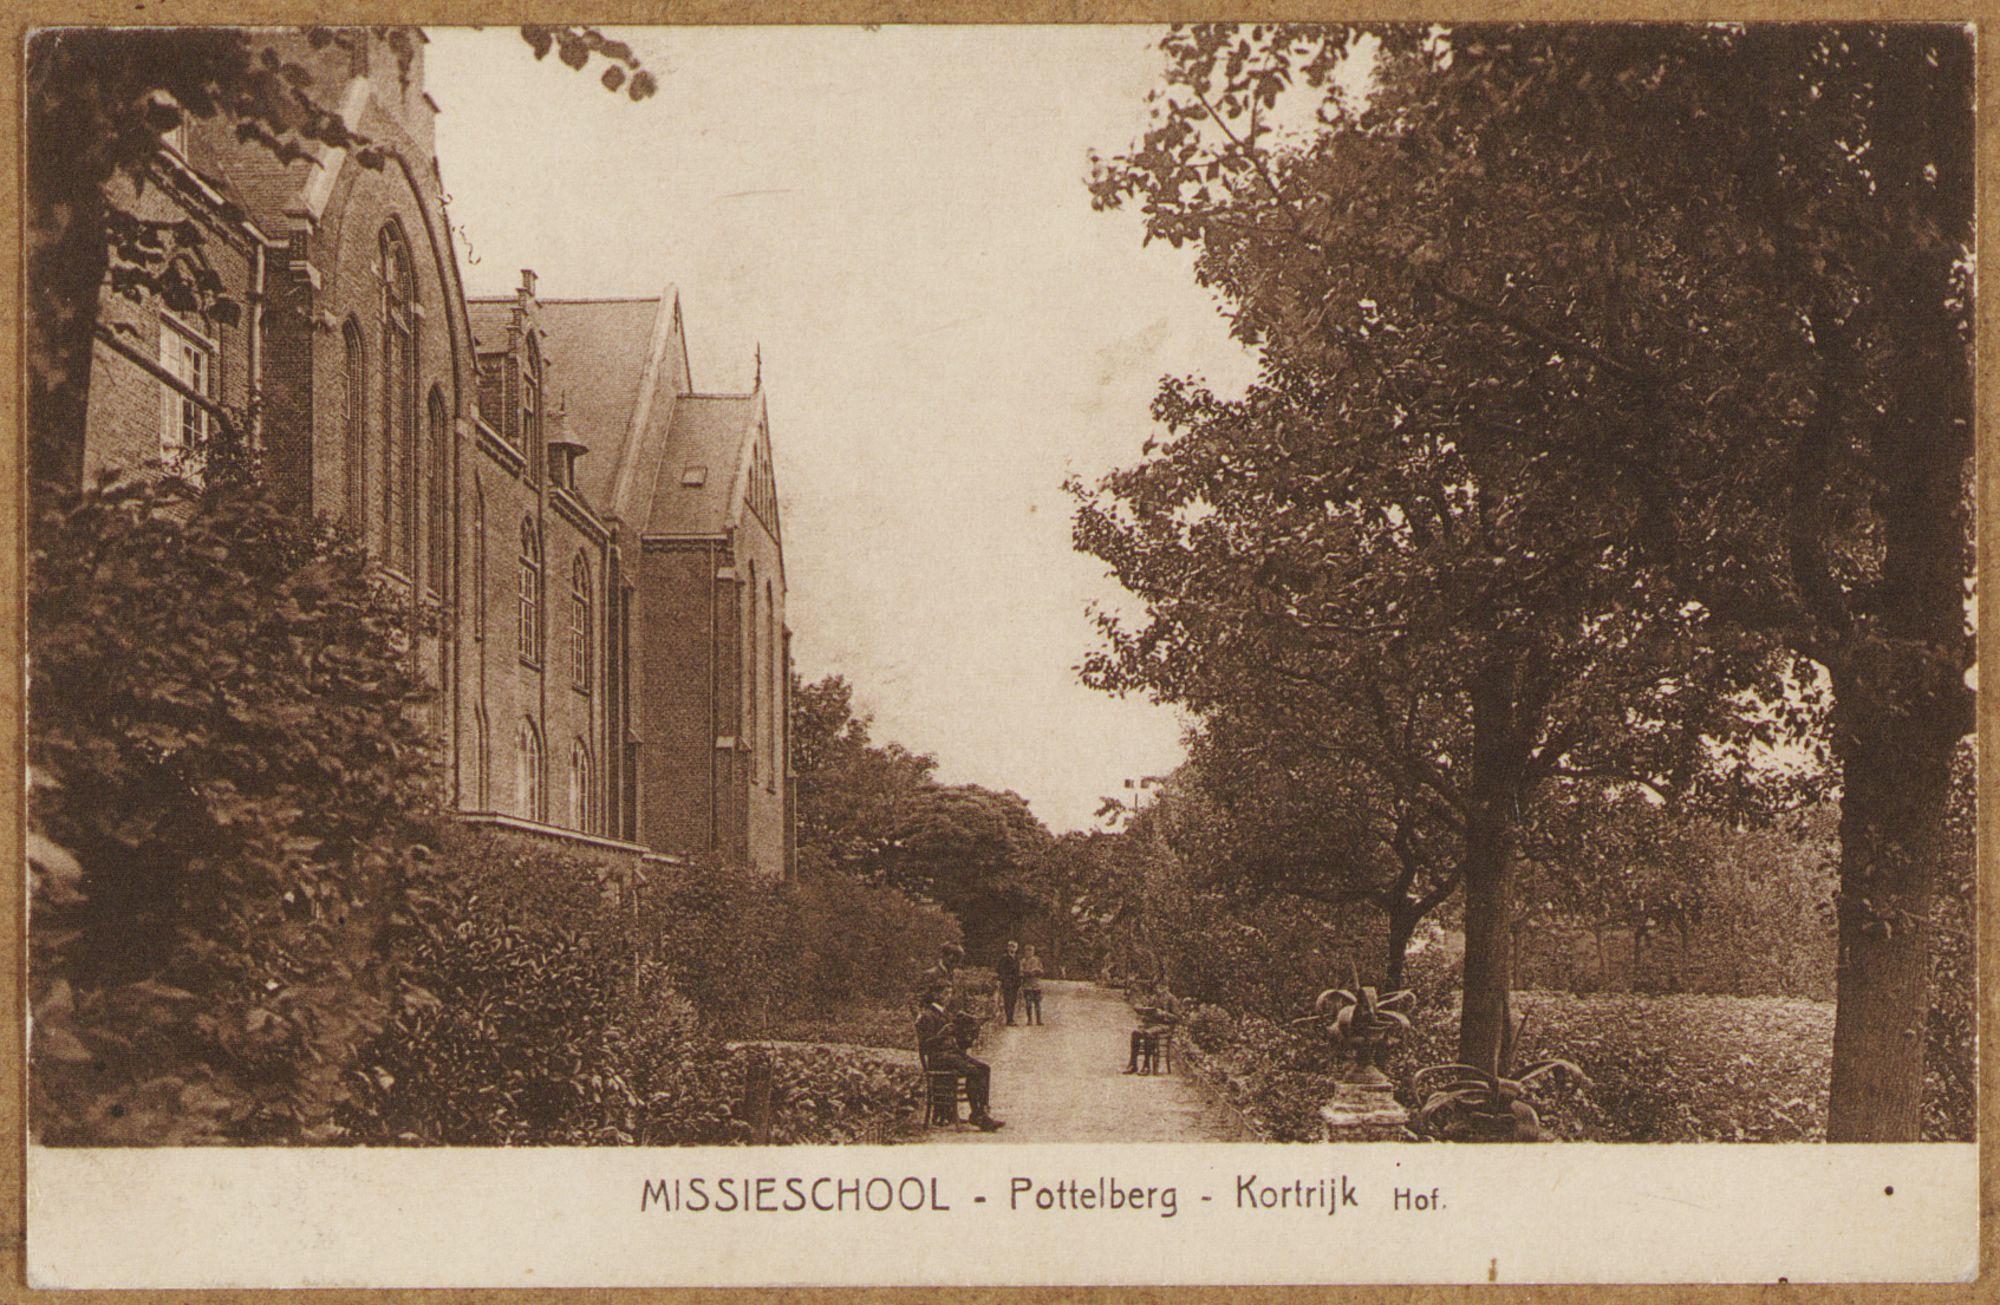 Missieschool Picpussen